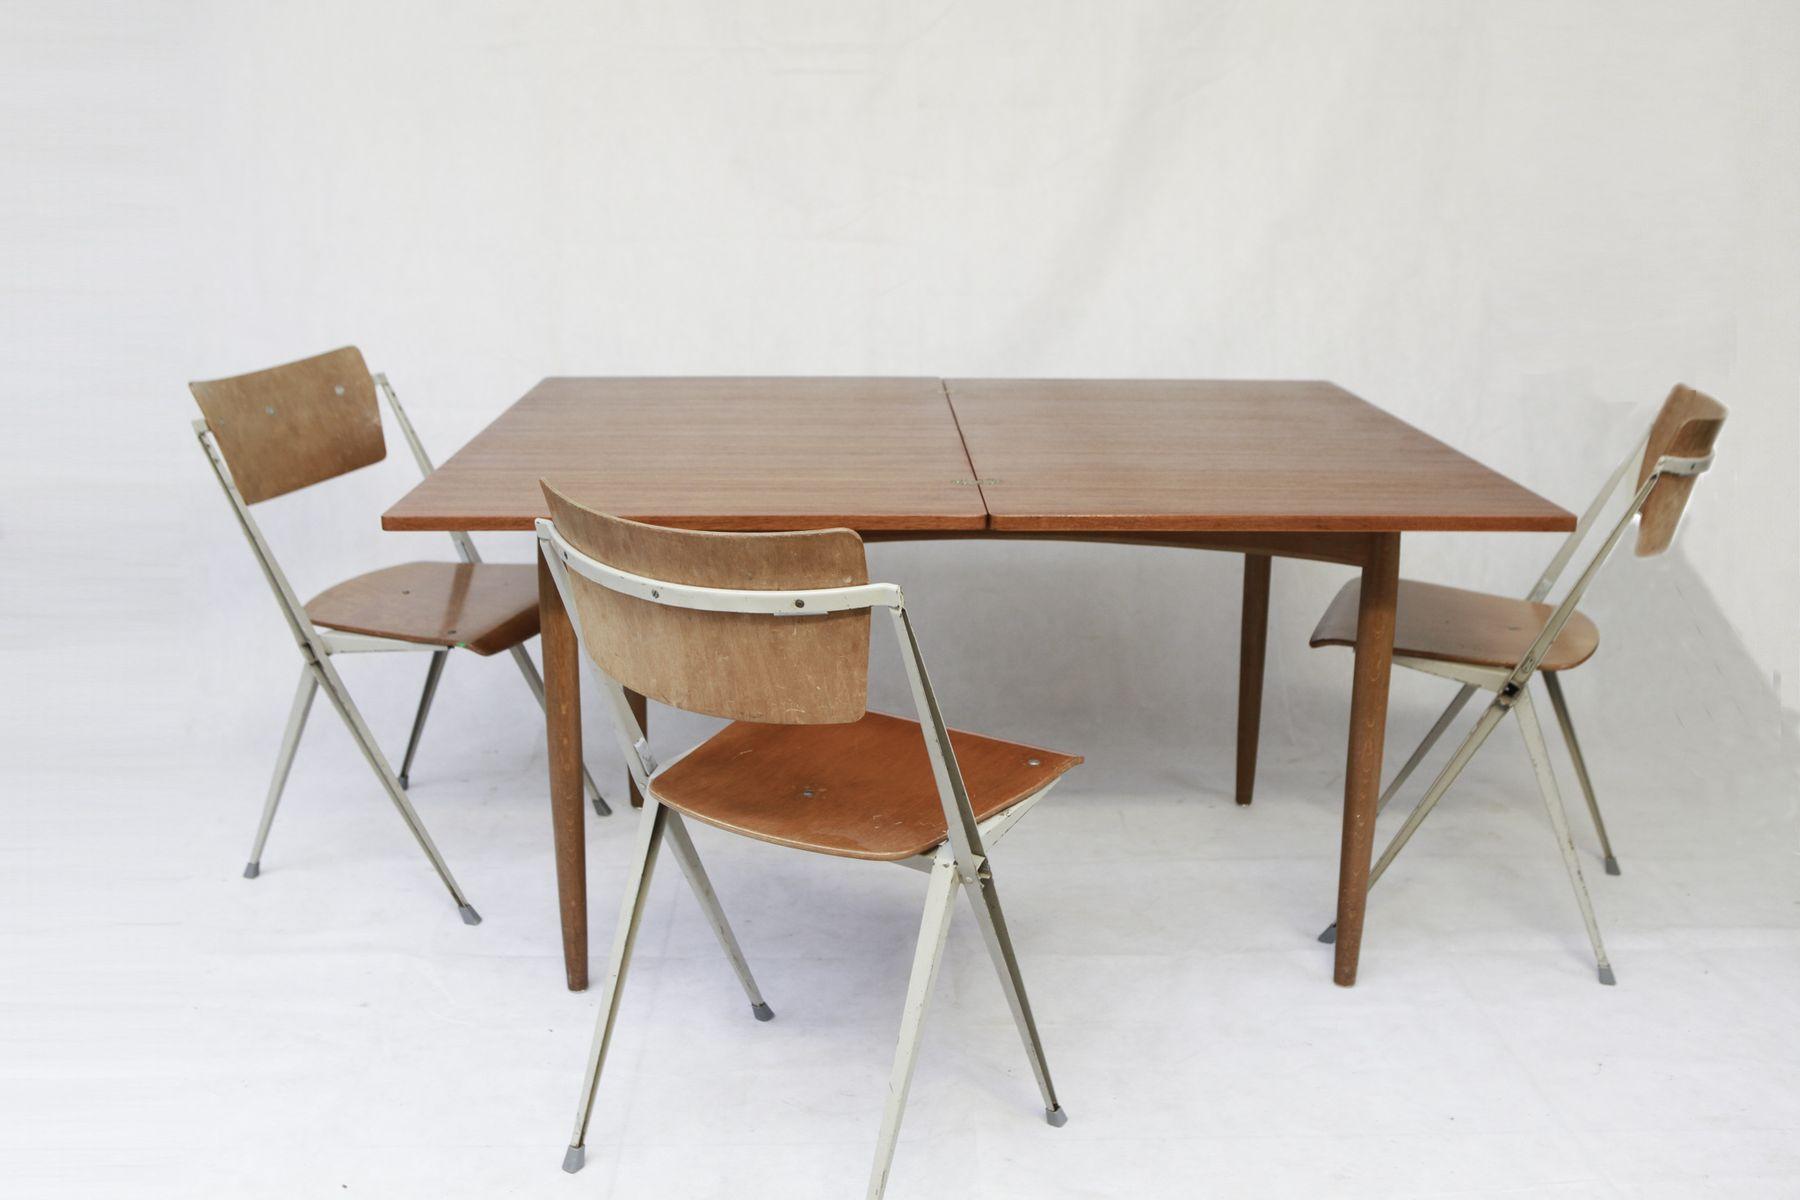 Vintage scandinavian extendable teak dining table for sale at pamono - Dining table scandinavian ...